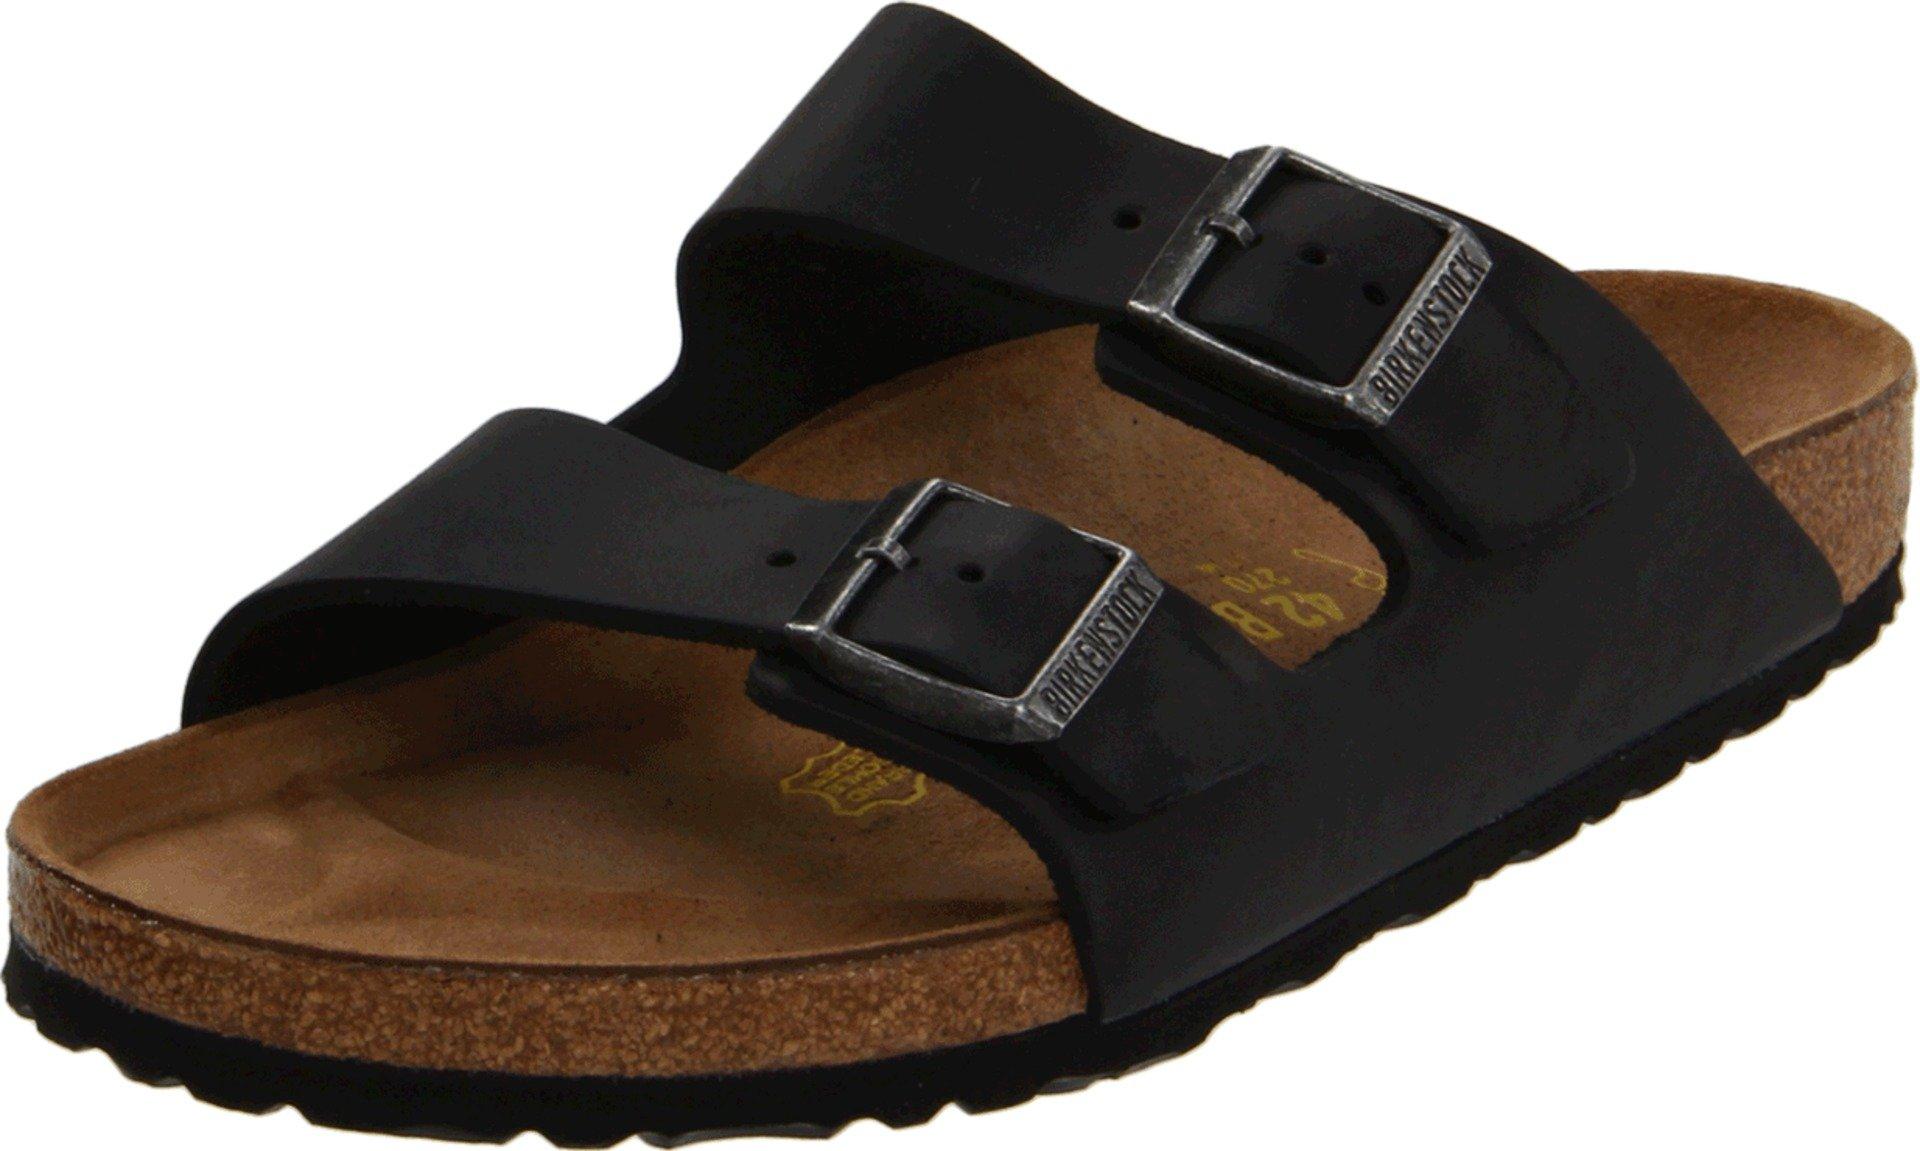 Birkenstock Unisex Arizona Slide Fashion Sandals, Black Leather, 36 M